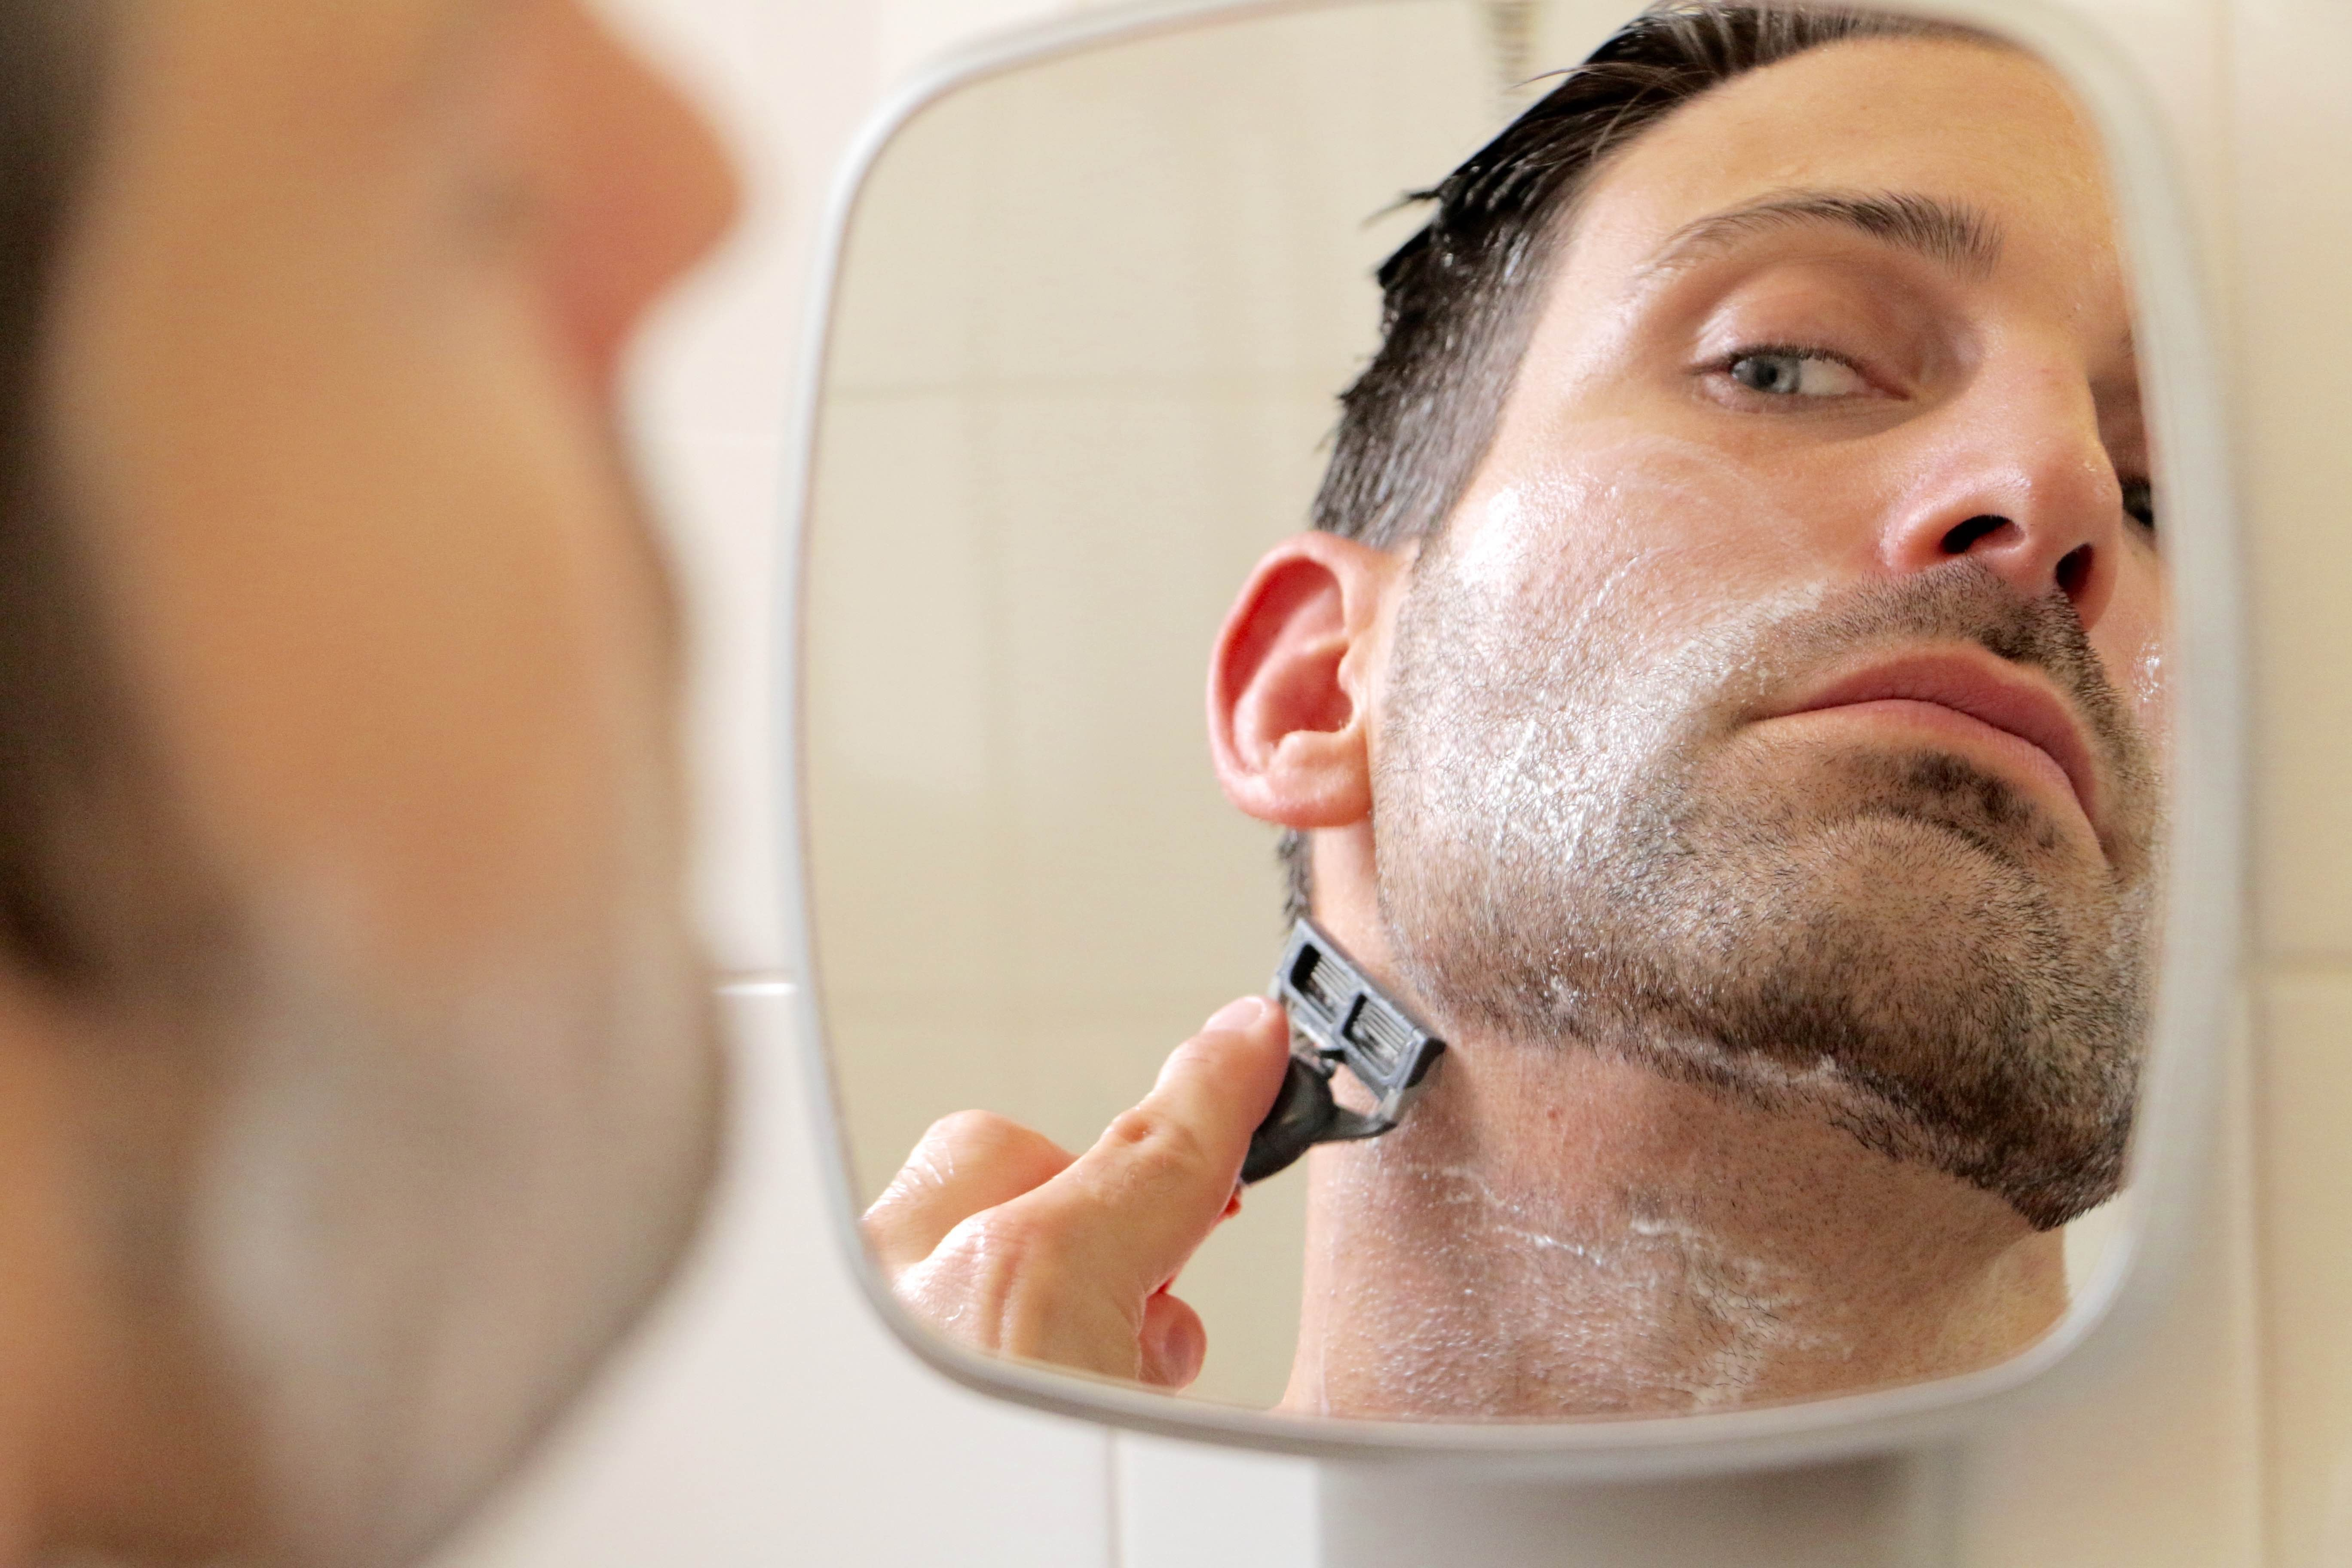 Shaving 9